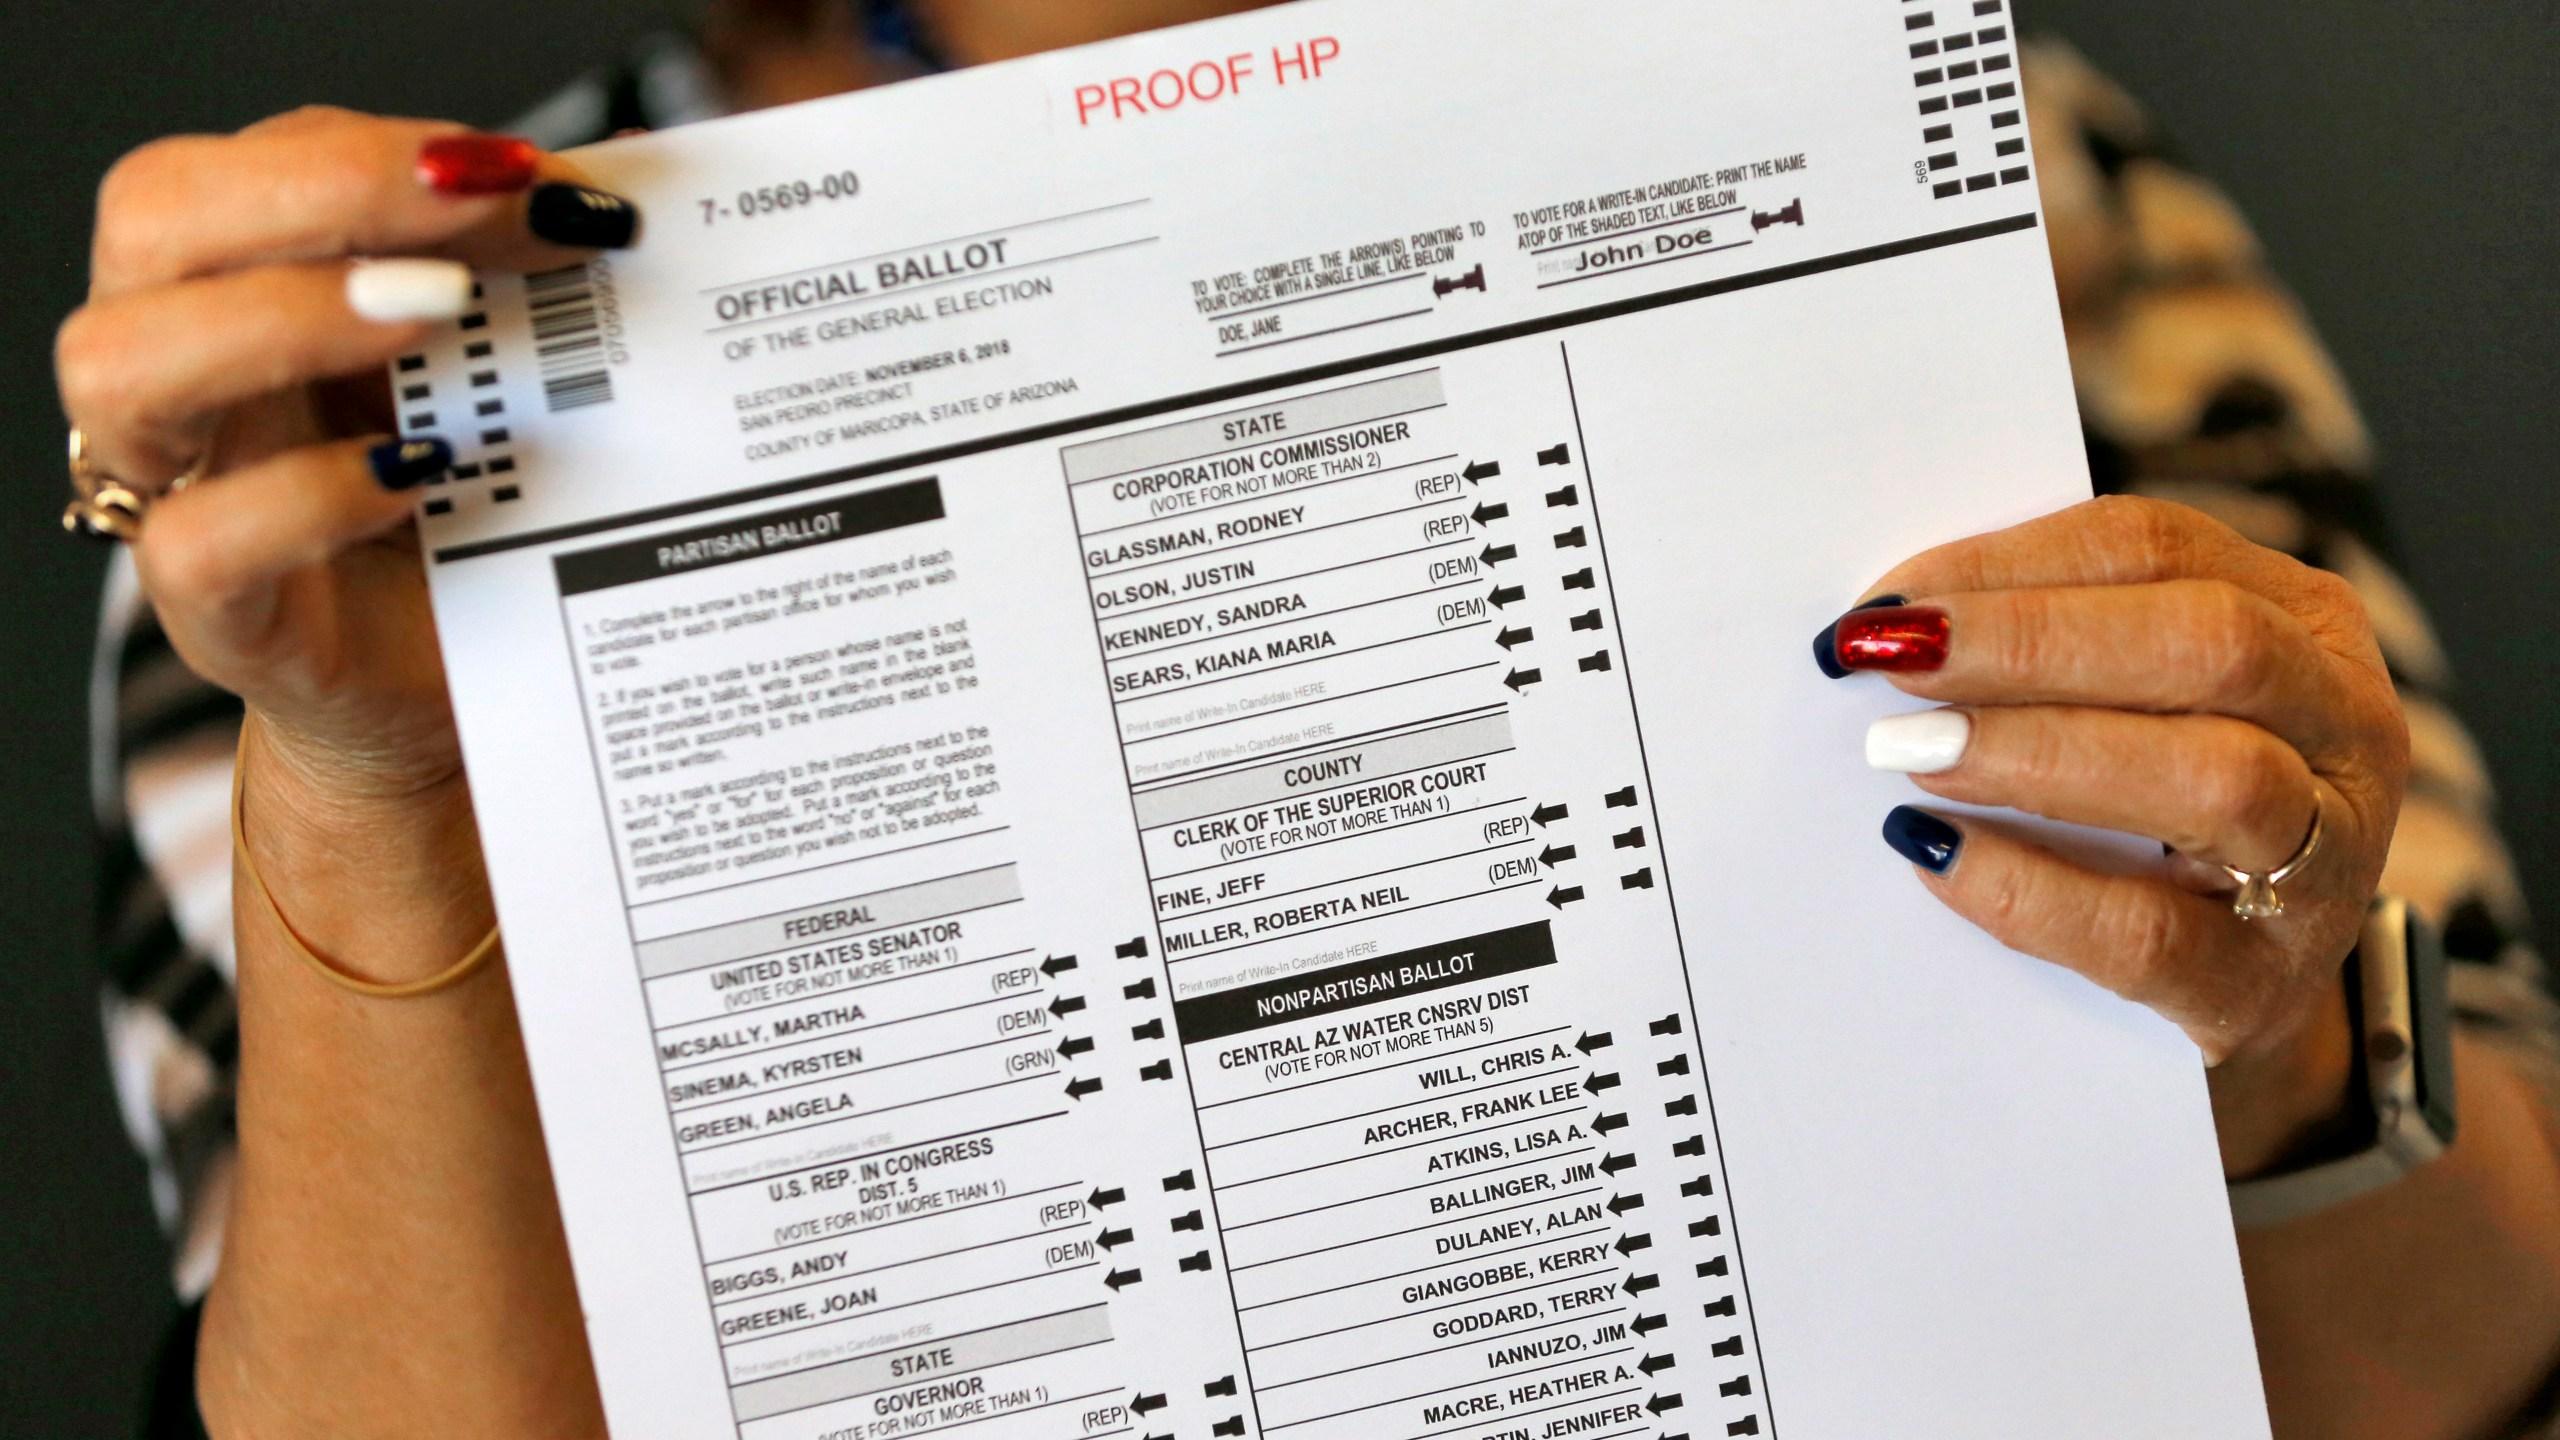 Election_2018_Arizona_Voting_Problems_86269-159532.jpg28466508